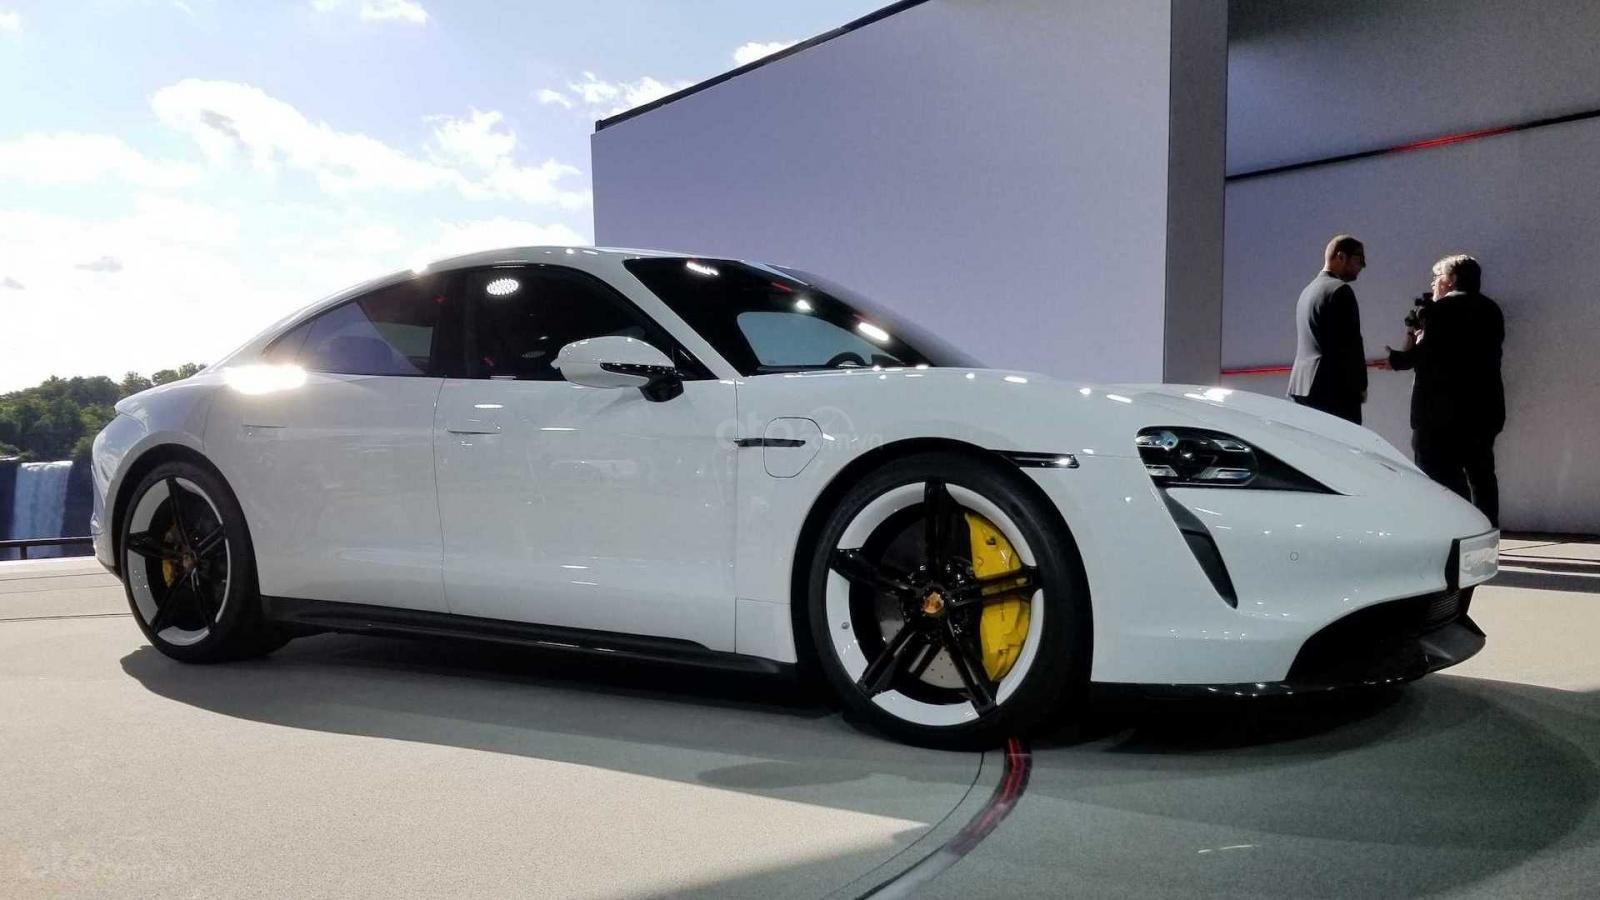 Thân xe Porsche Taycan 2020